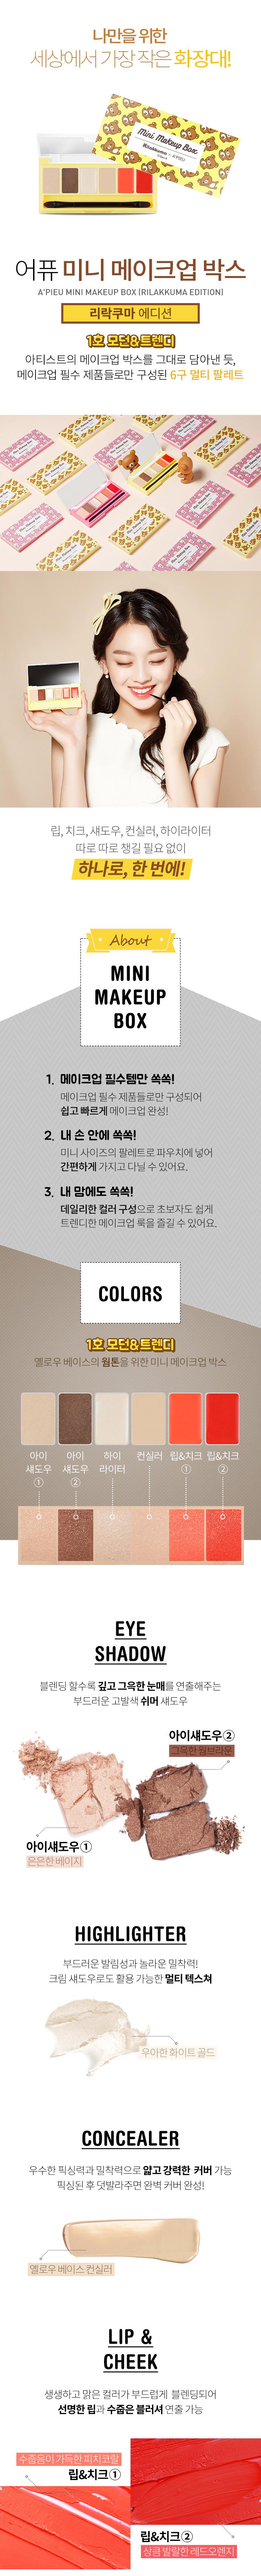 a-pieu-rilakkuma-mini-makeup-box-modern-4.jpg